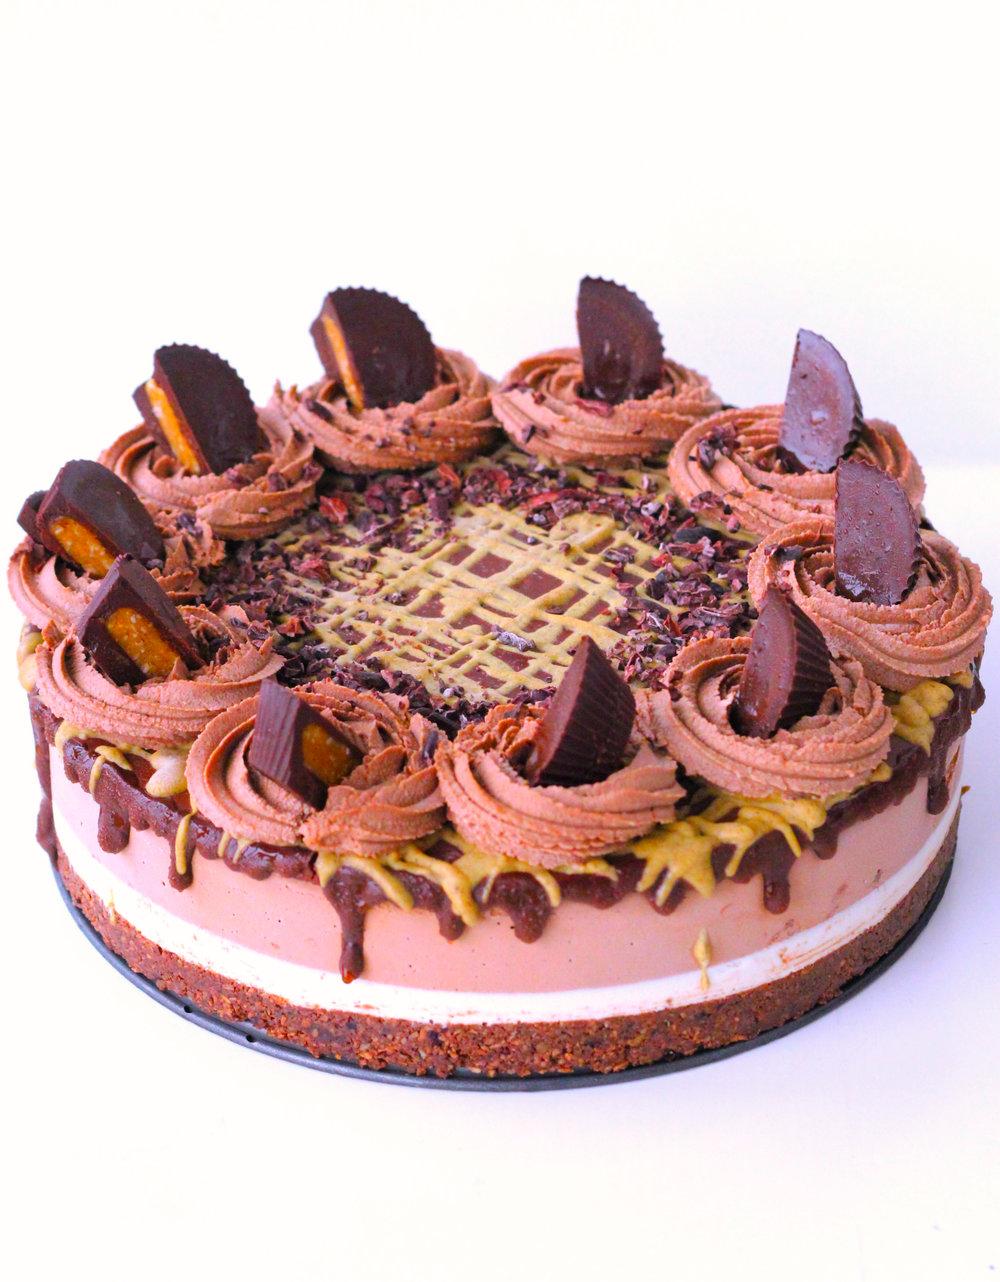 Choco mocca peanut butter cake_2.jpg